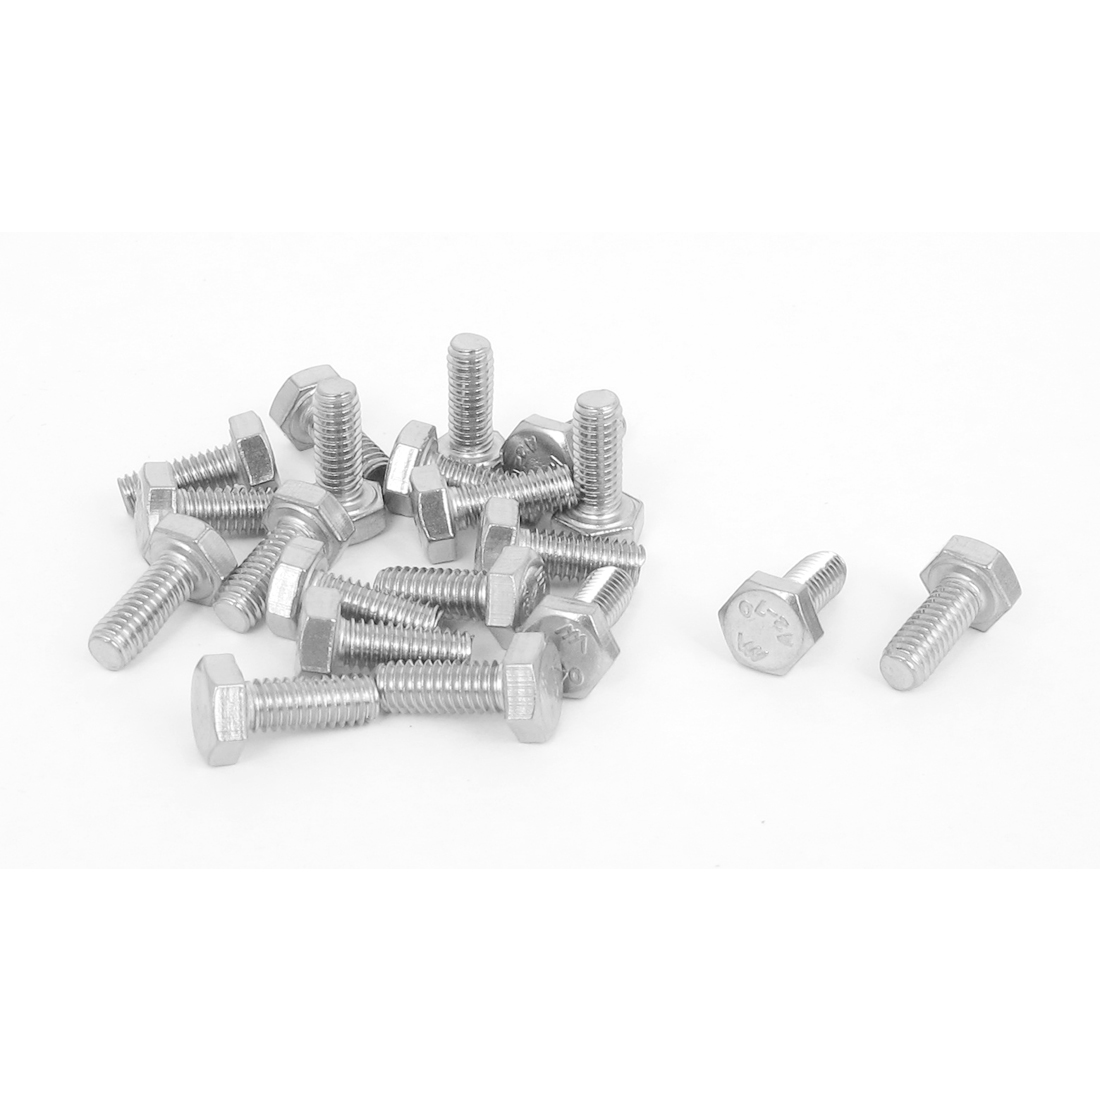 M4x10mm Thread 304 Stainless Steel Hex Hexagon Head Screw Bolt 20pcs